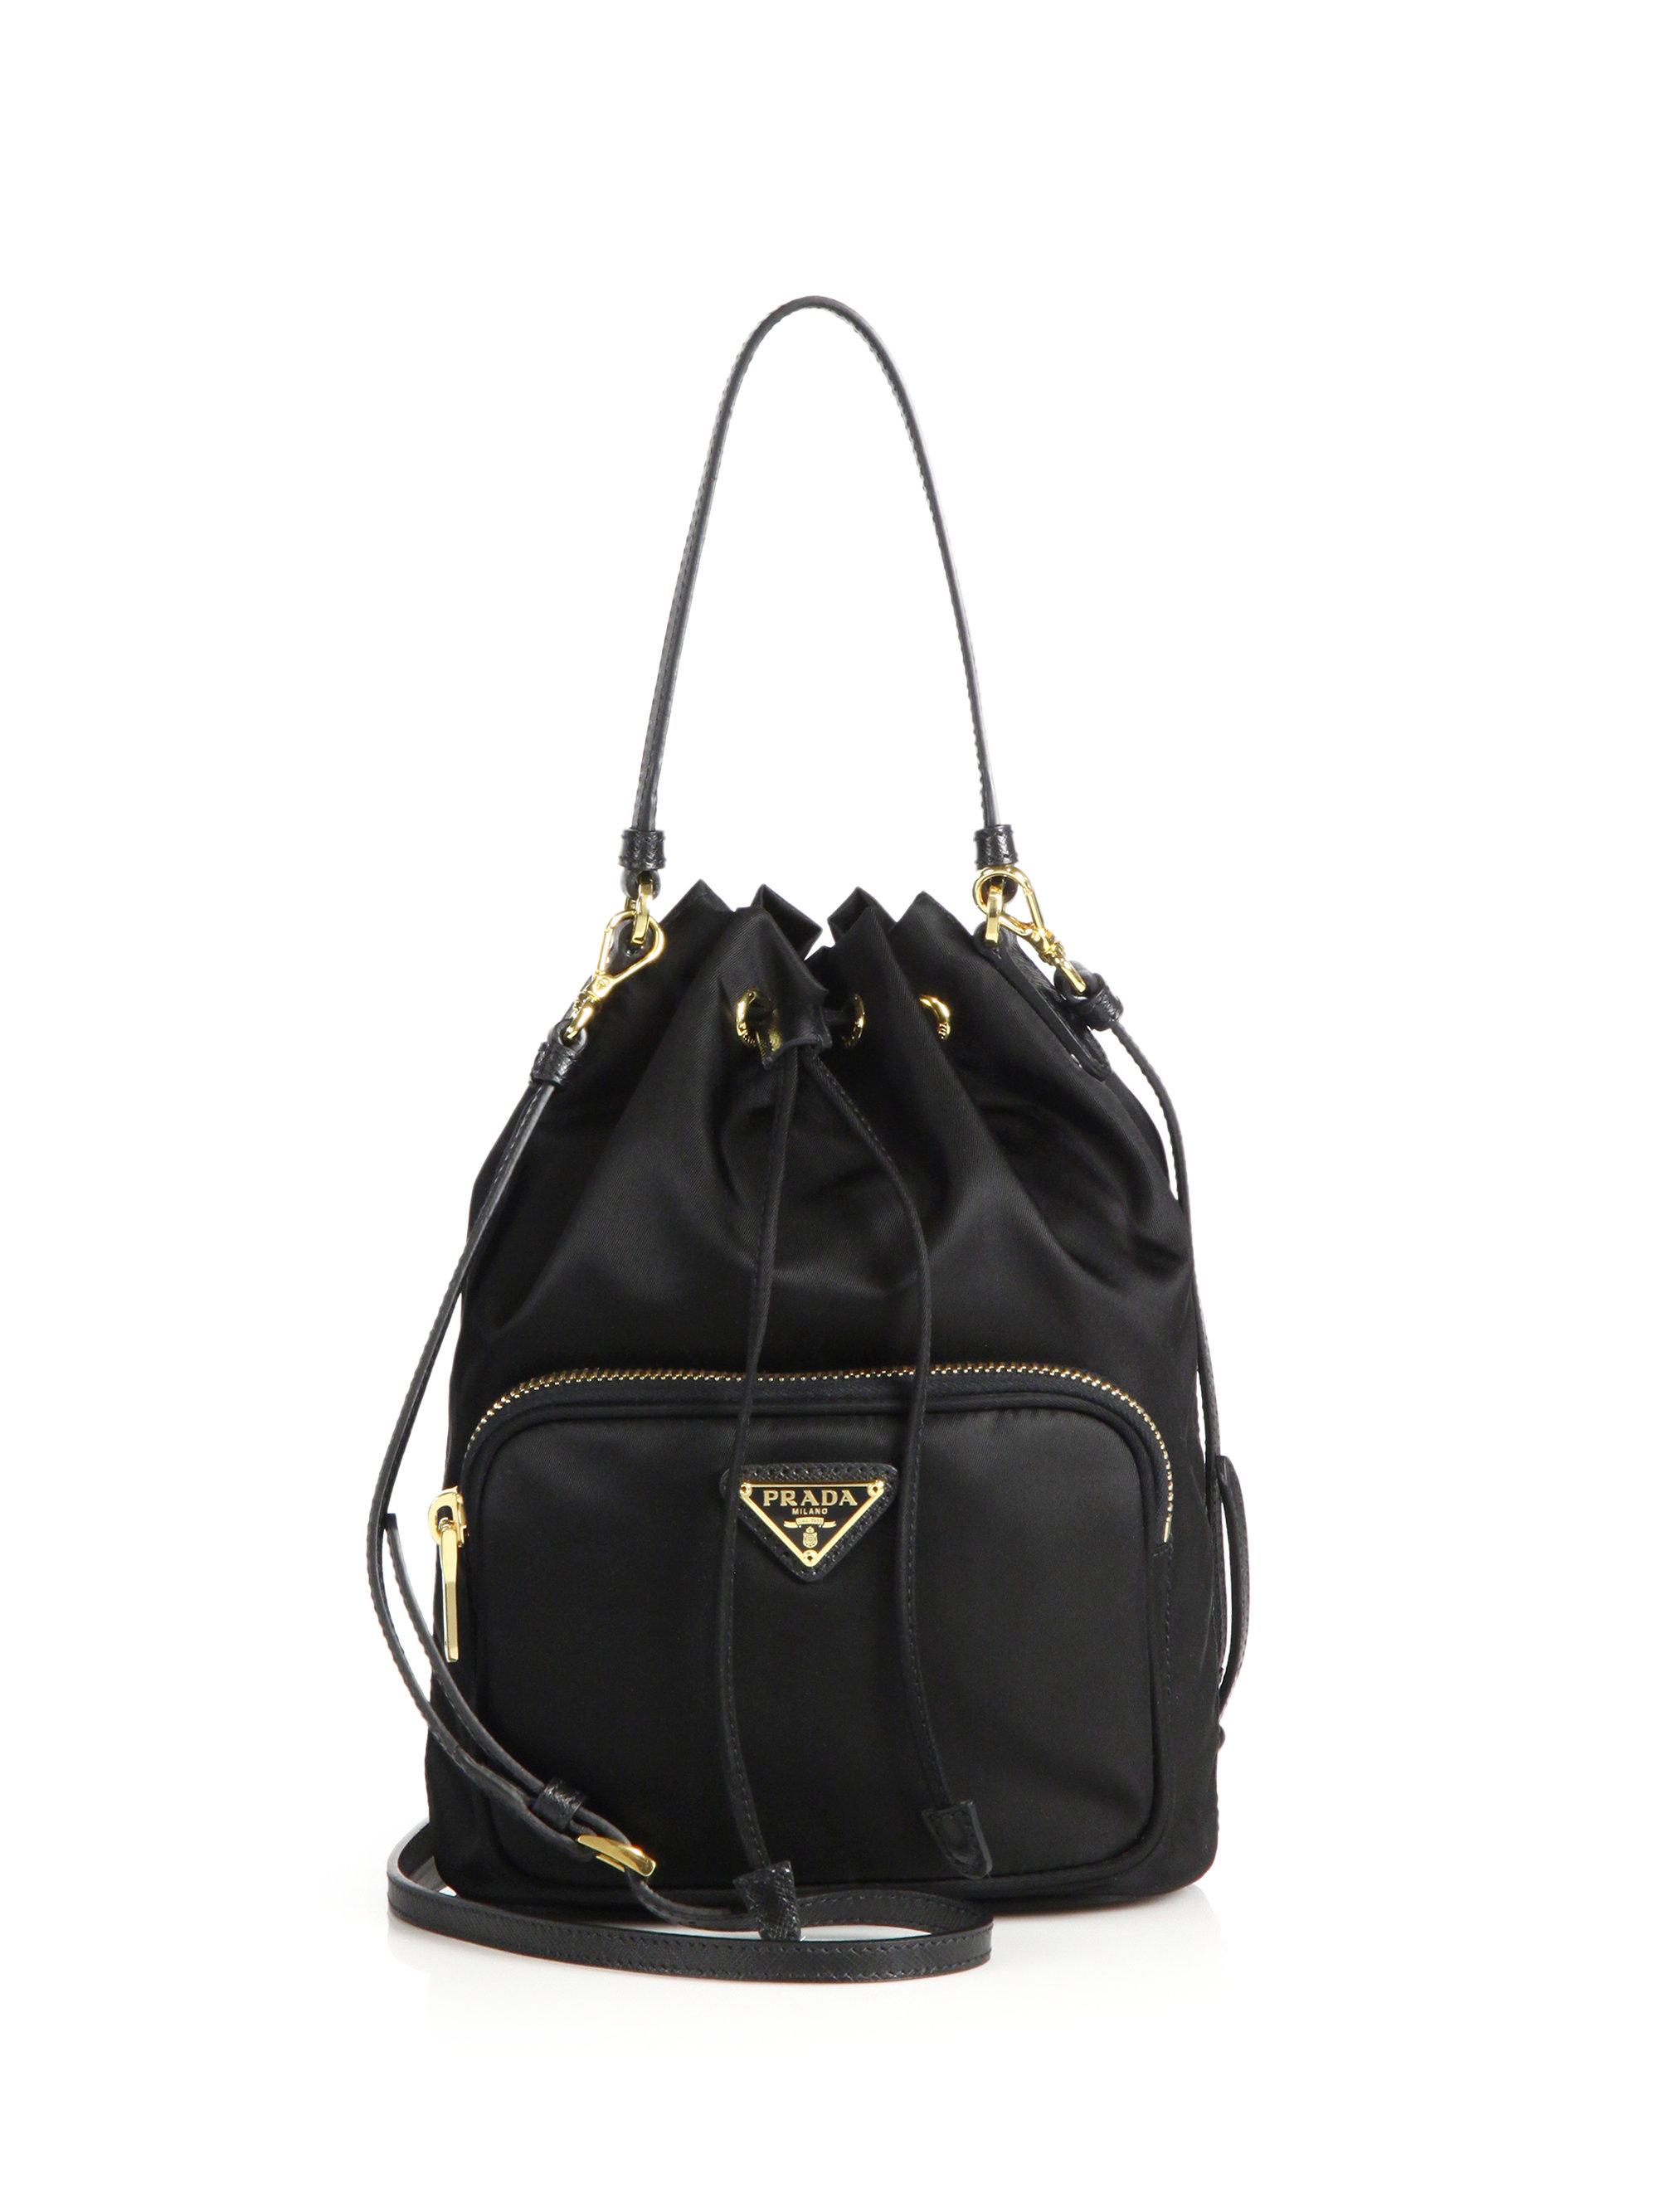 f0e35b783669 ... coupon lyst prada mini nylon leather bucket bag in black 33033 ed349